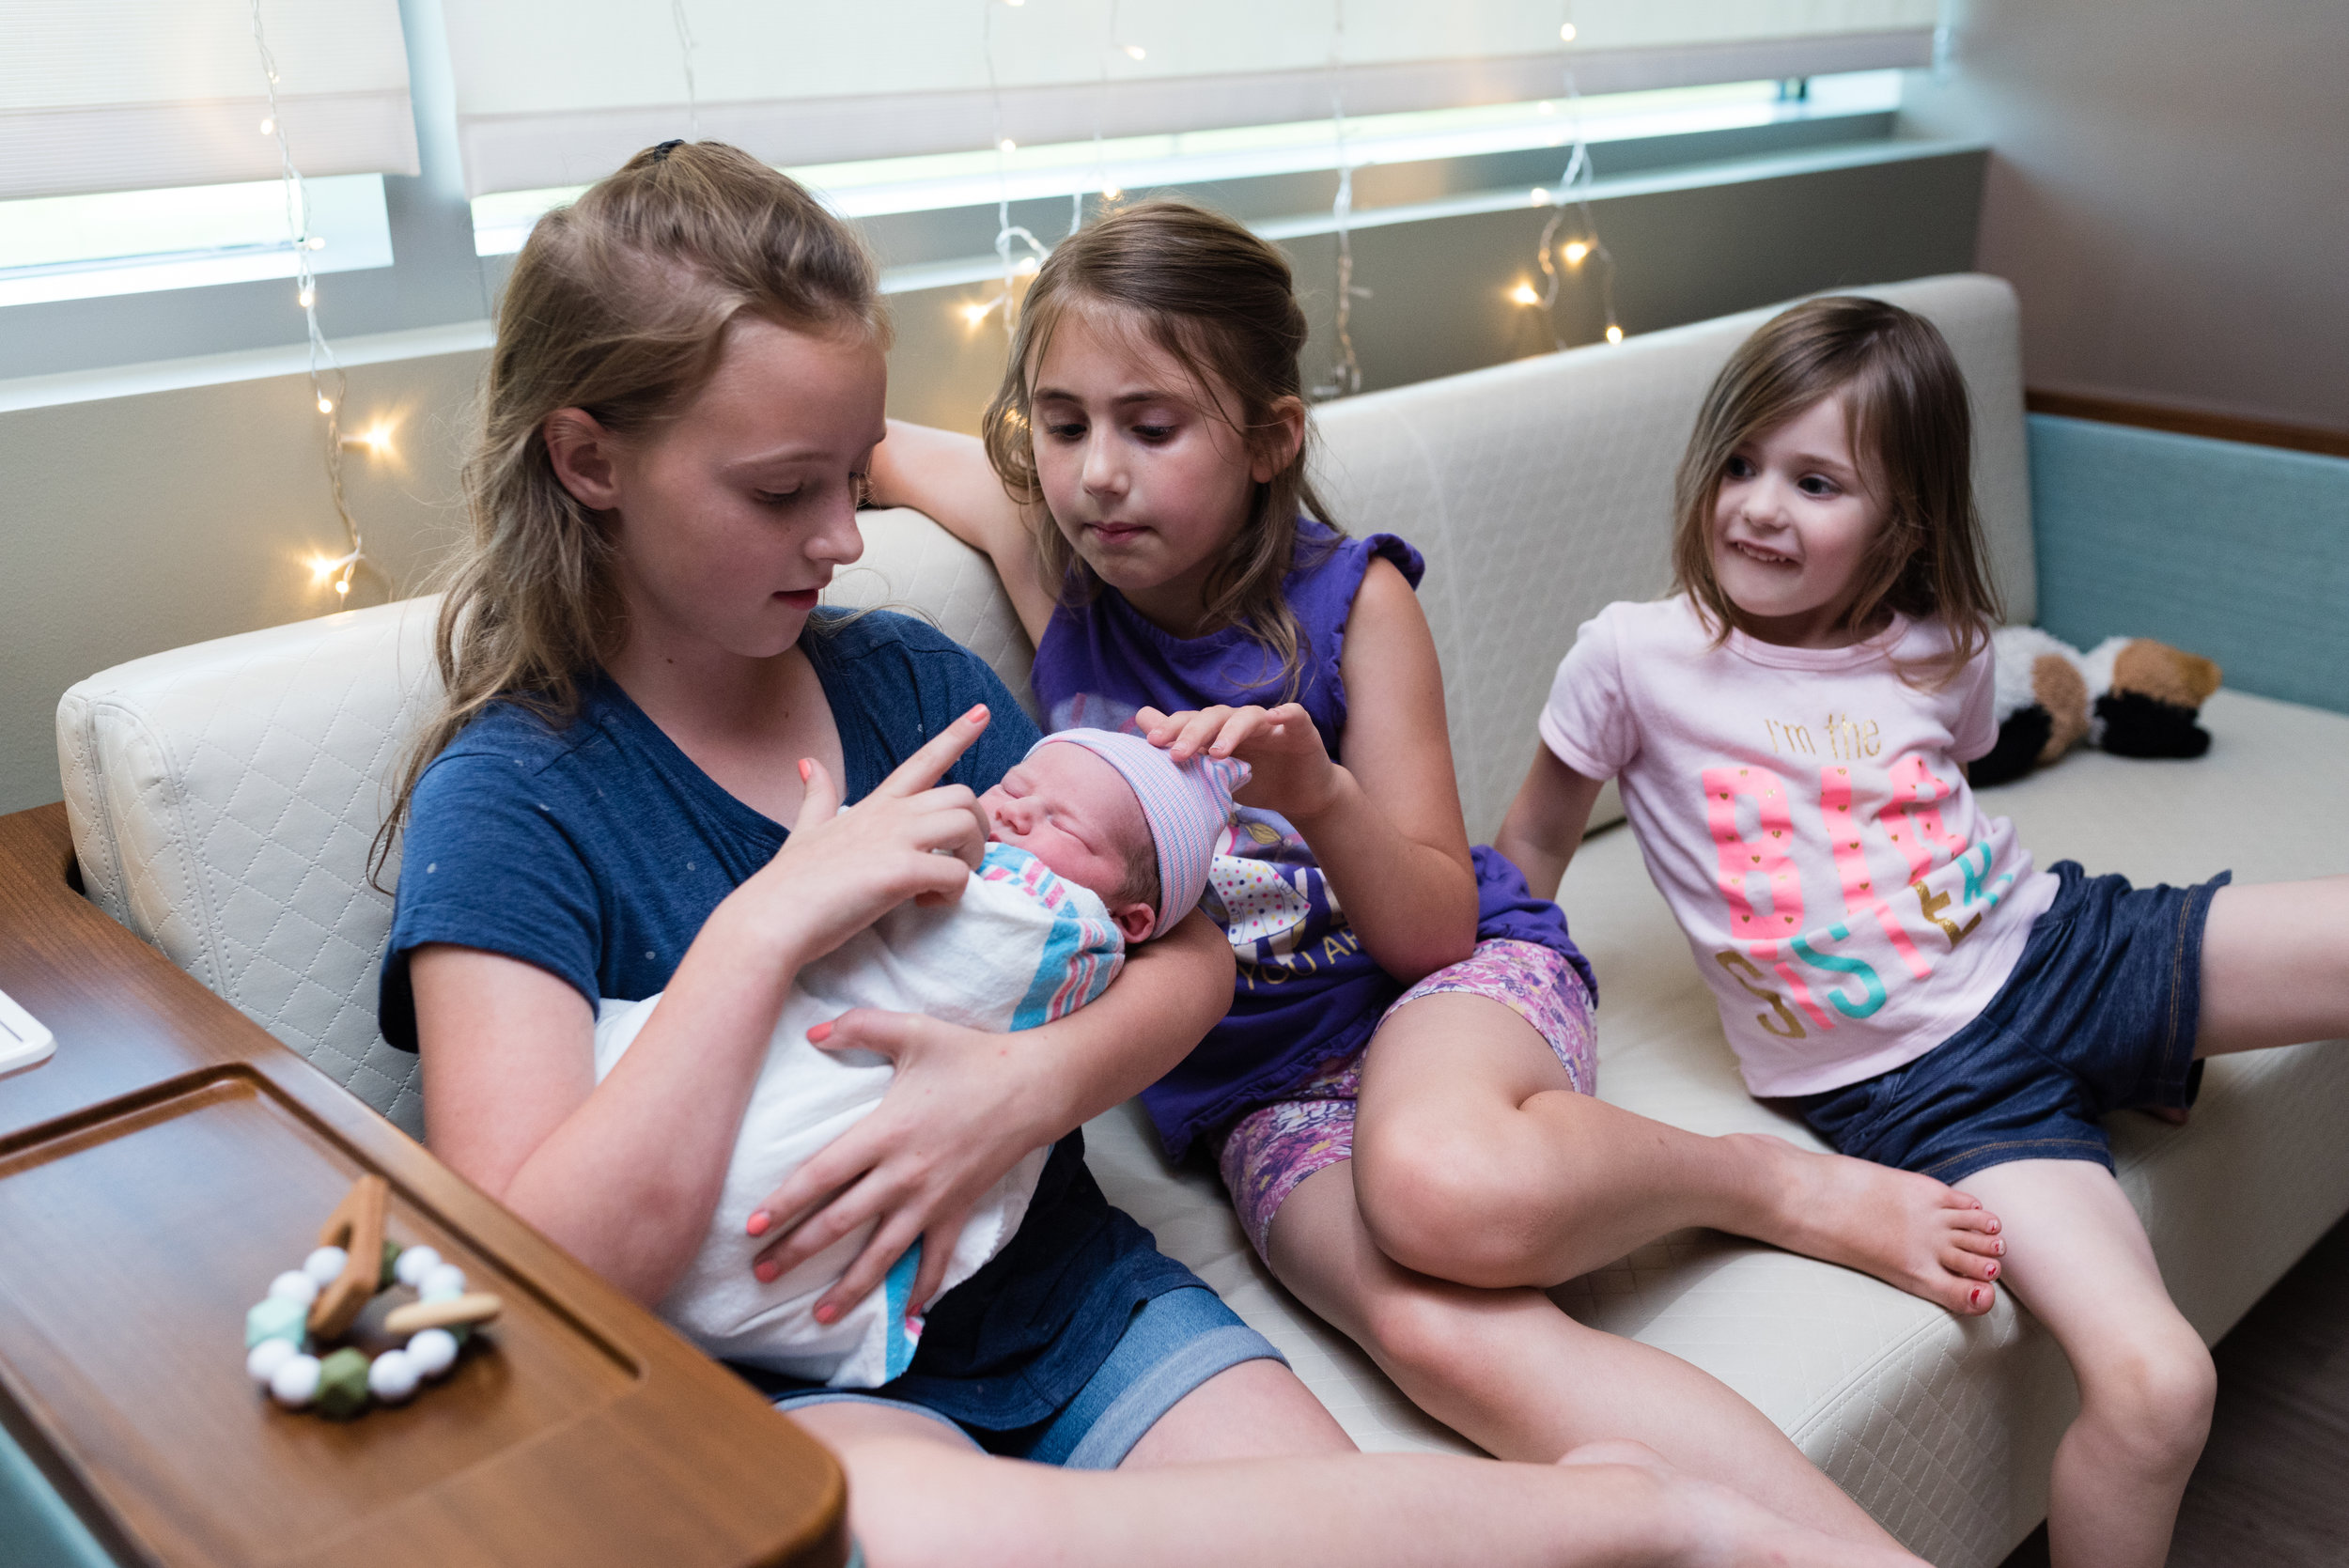 newborn meeting siblings